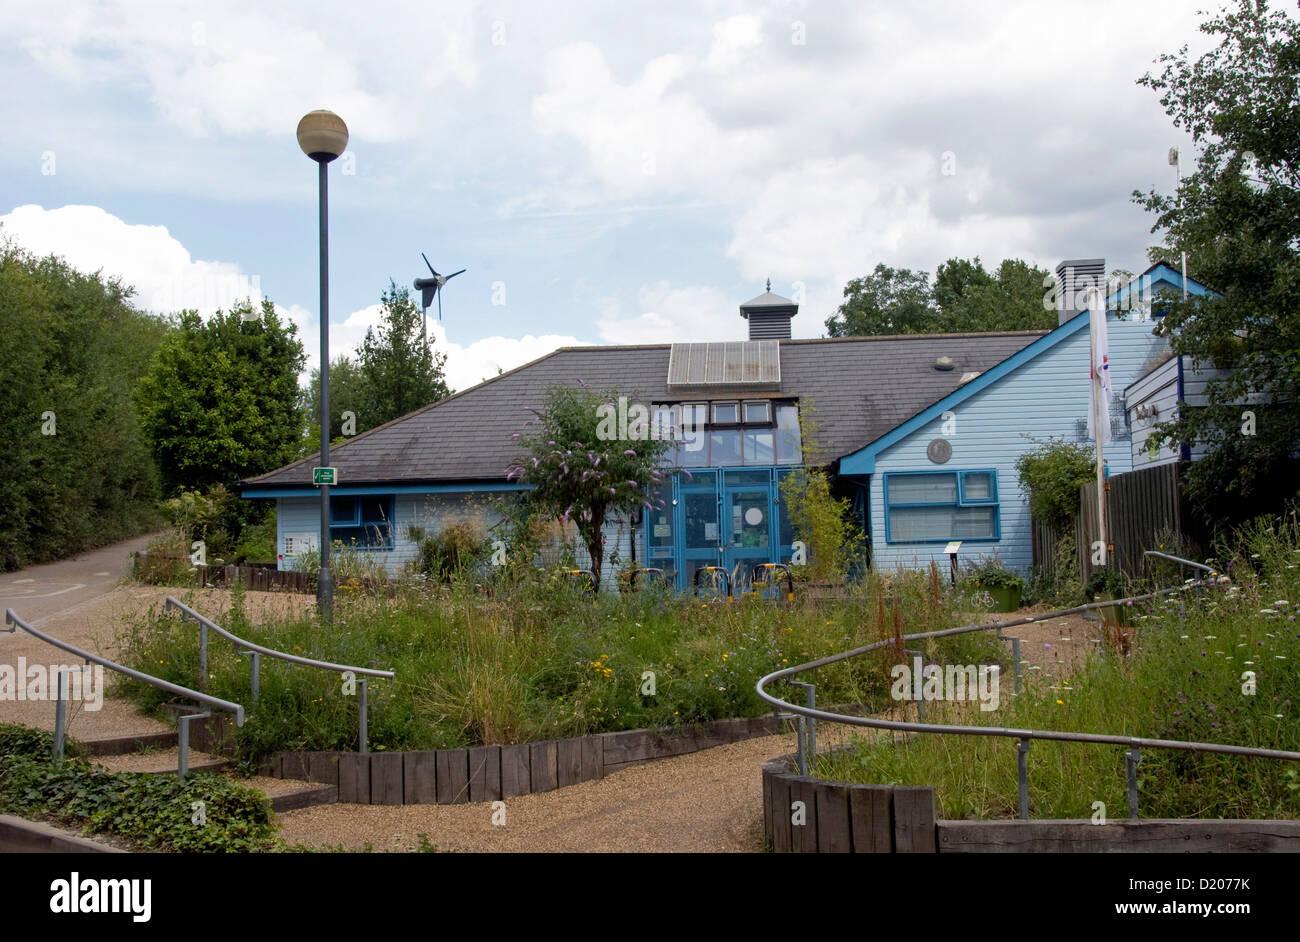 Islington Ecology Centre, Gillespie Park Nature Reserve, Highbury, London, England UK - Stock Image